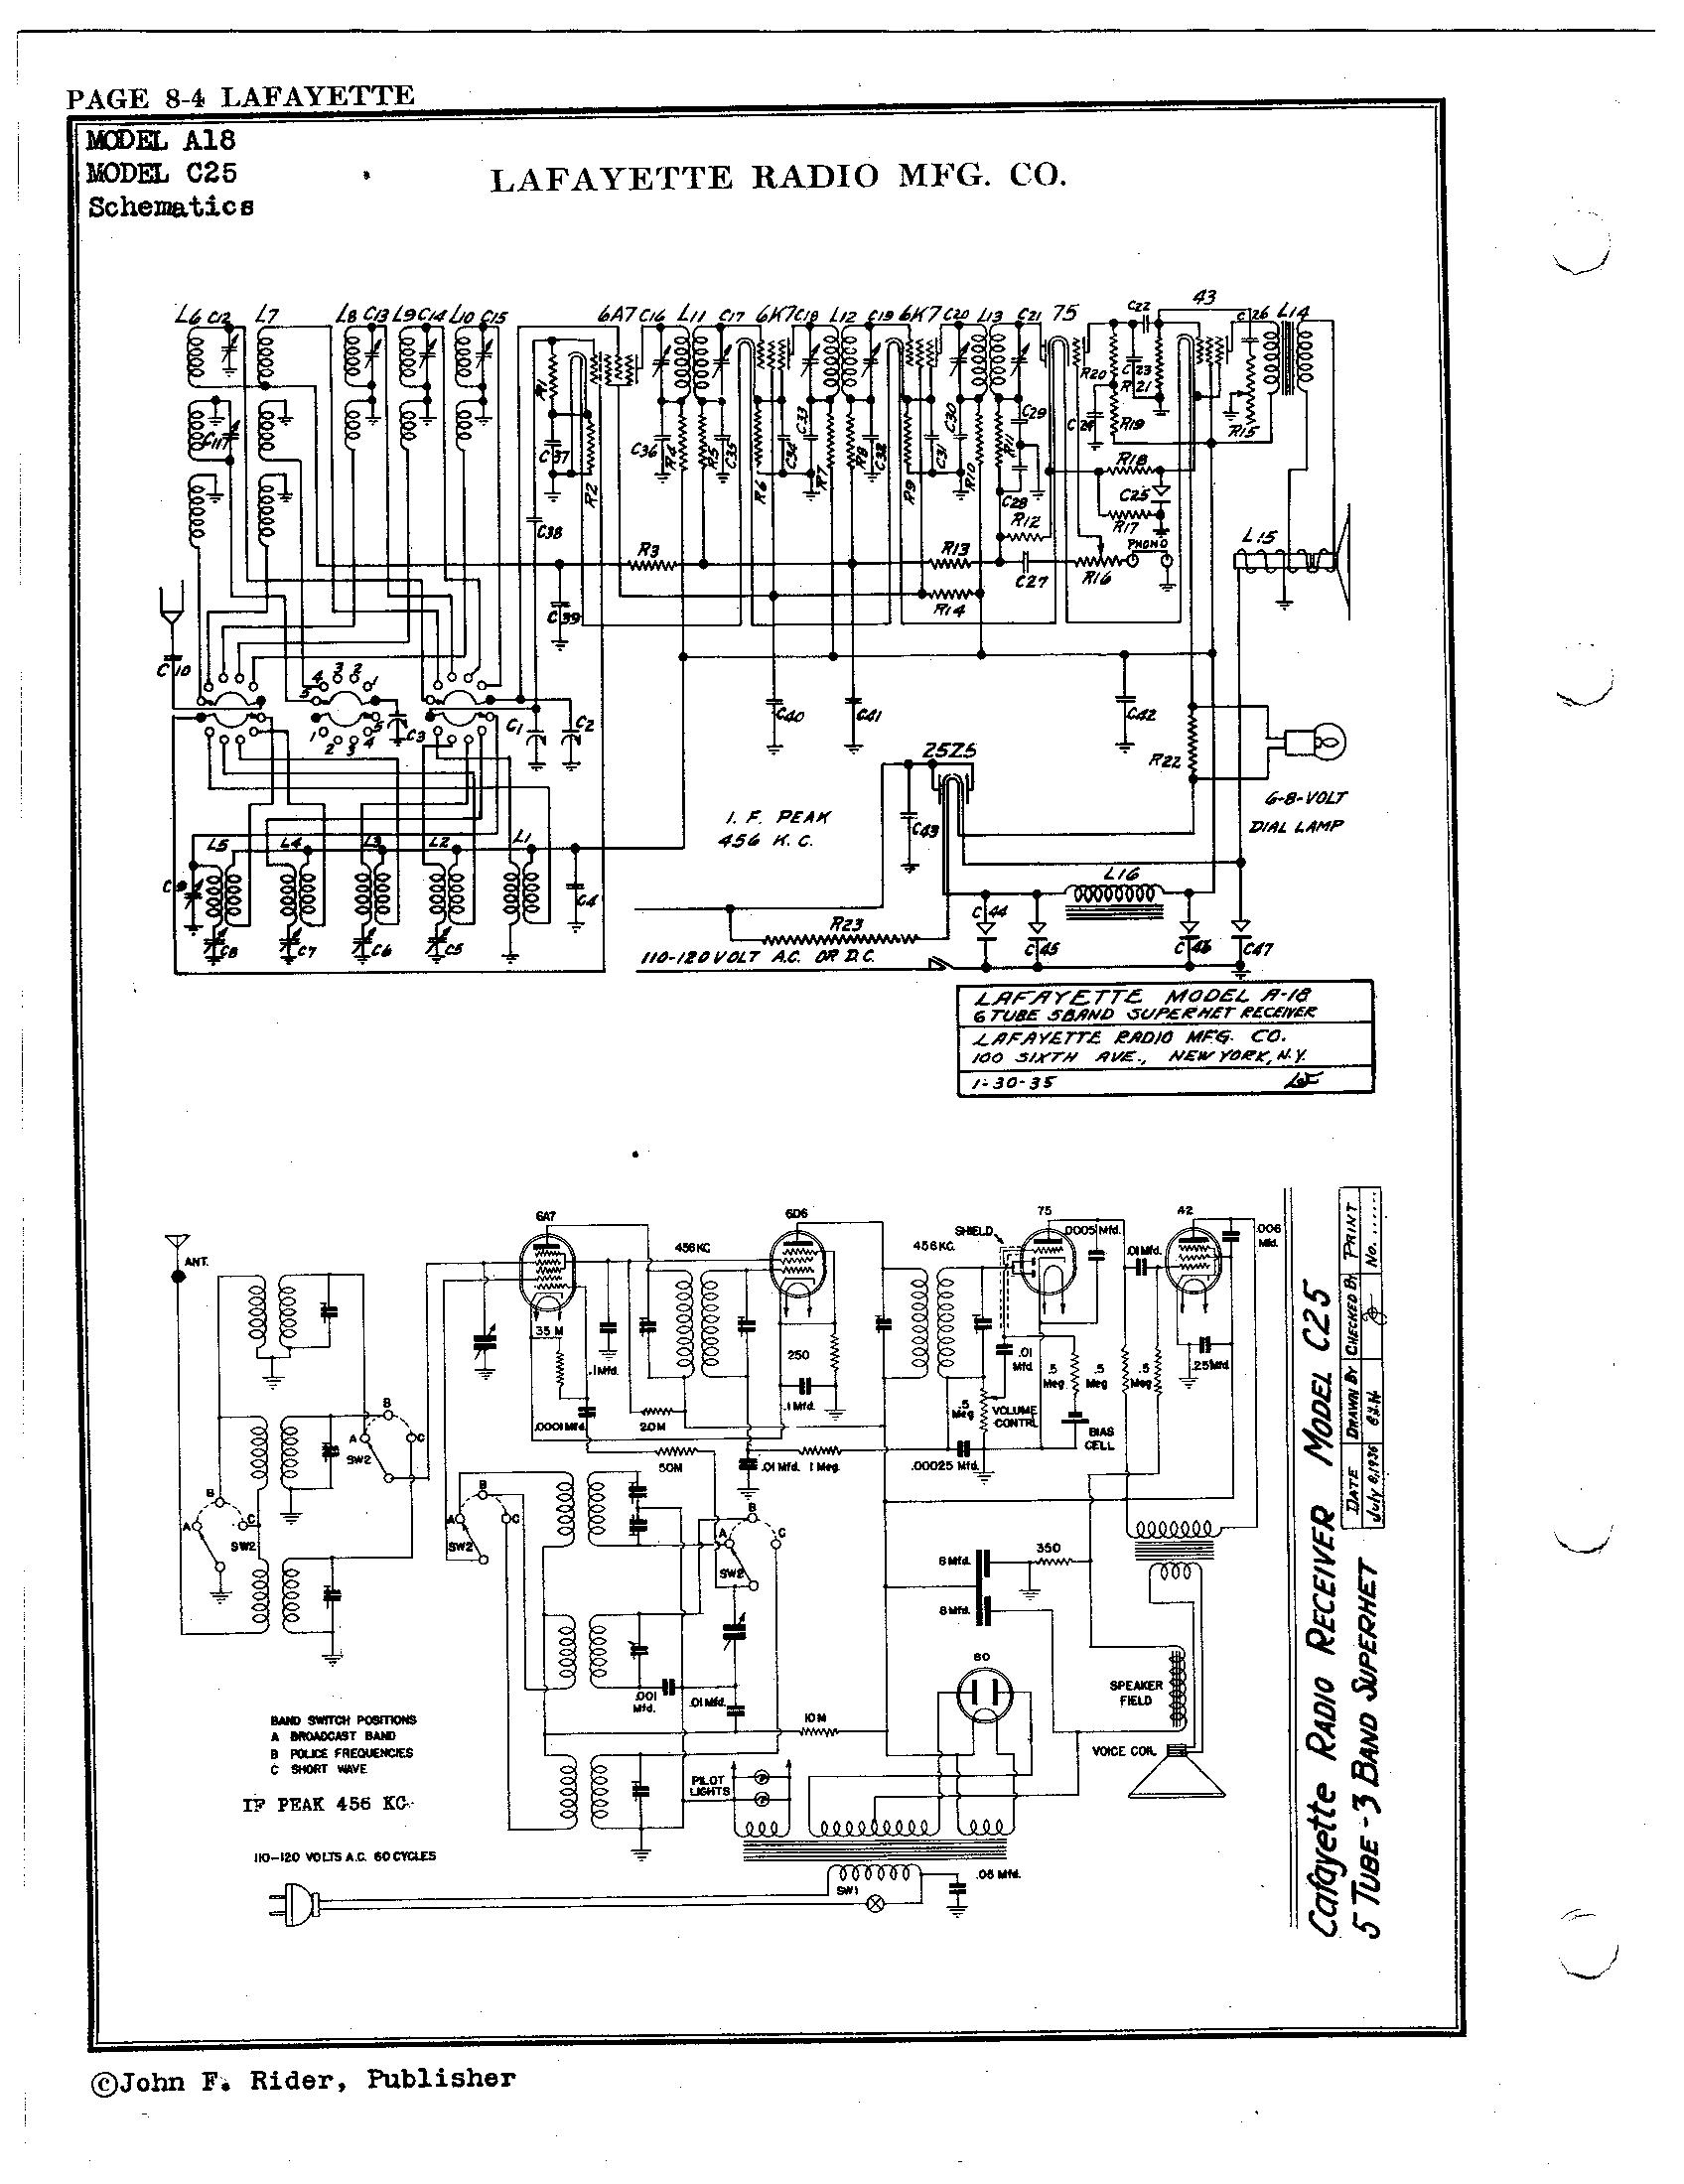 Lafayette Radio Mfg  Co  A18